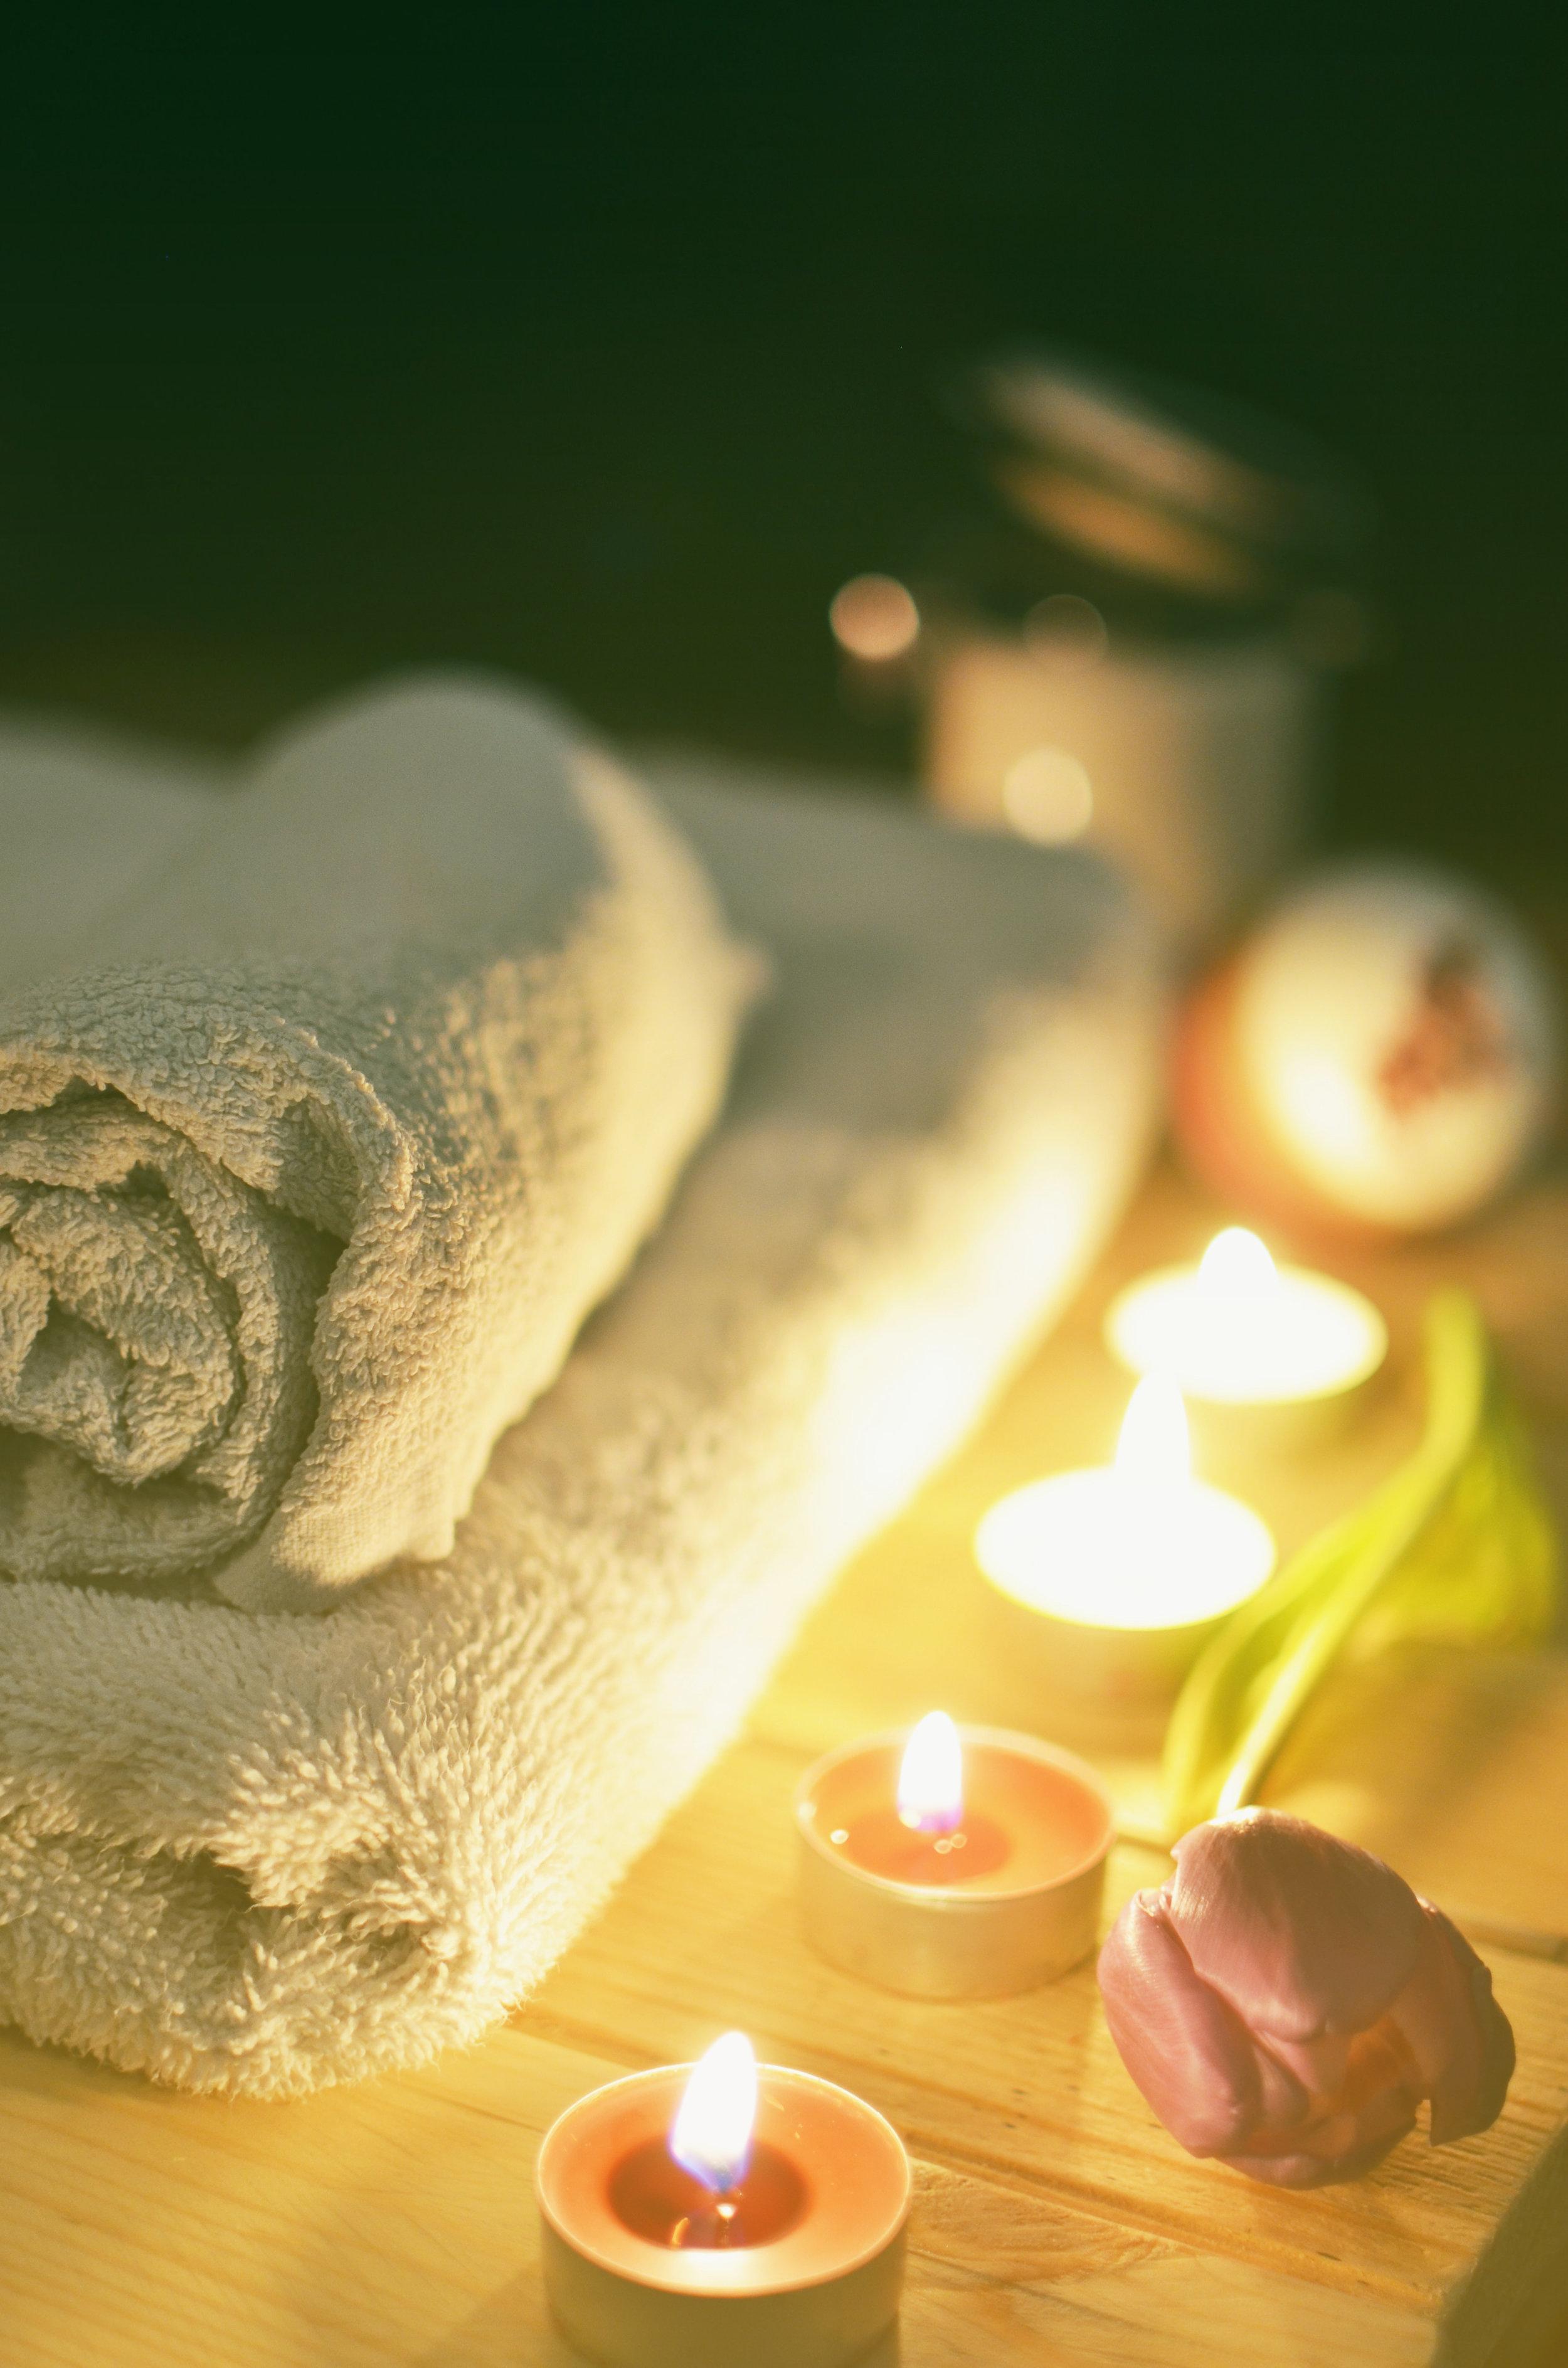 bath-bathroom-candlelight-3188 copy.jpg